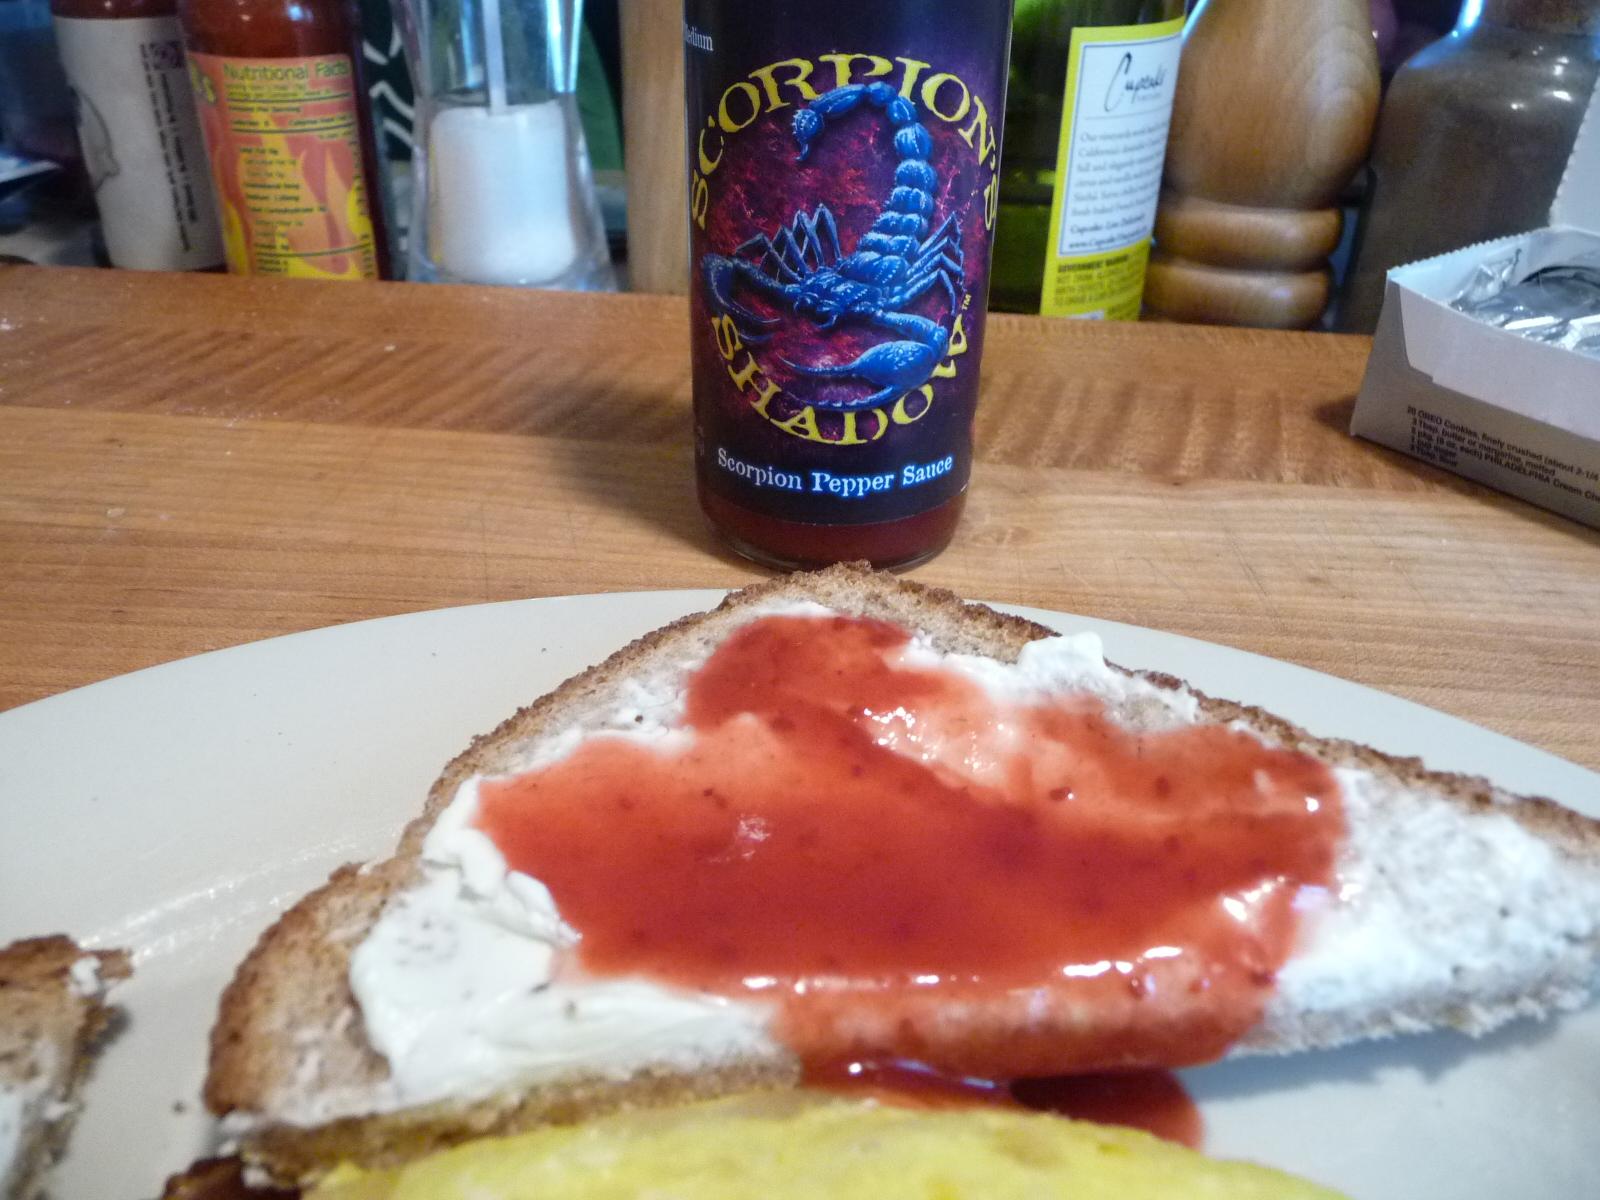 Scorpion's Shadow on cream cheese toast